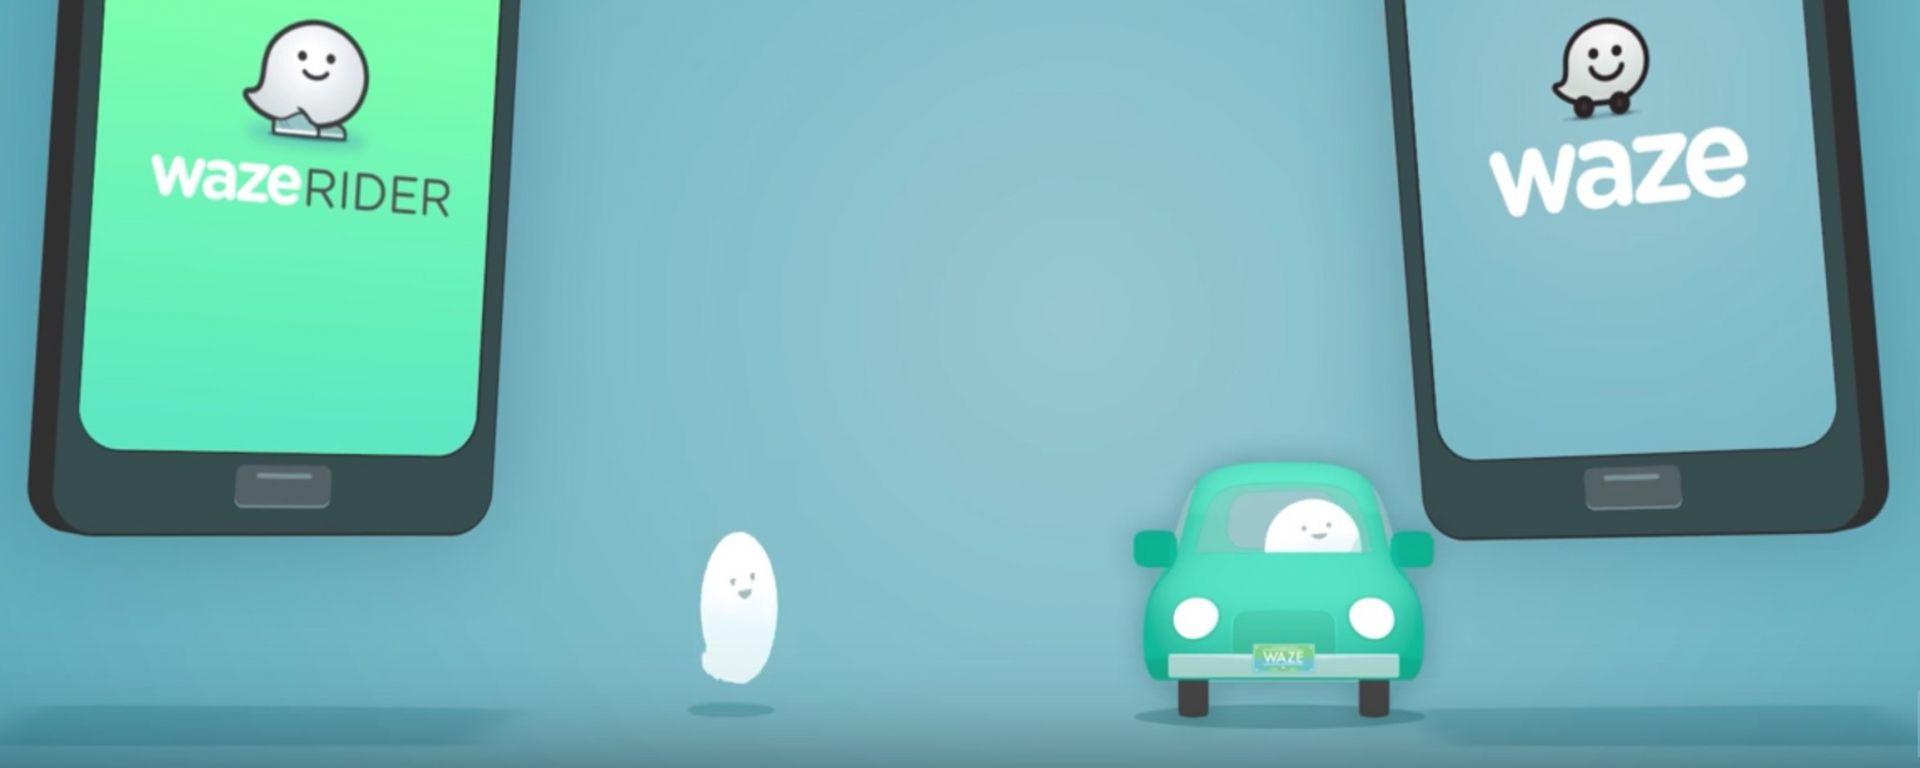 Waze Rider: Google sfida Uber nei trasporti a San Francisco